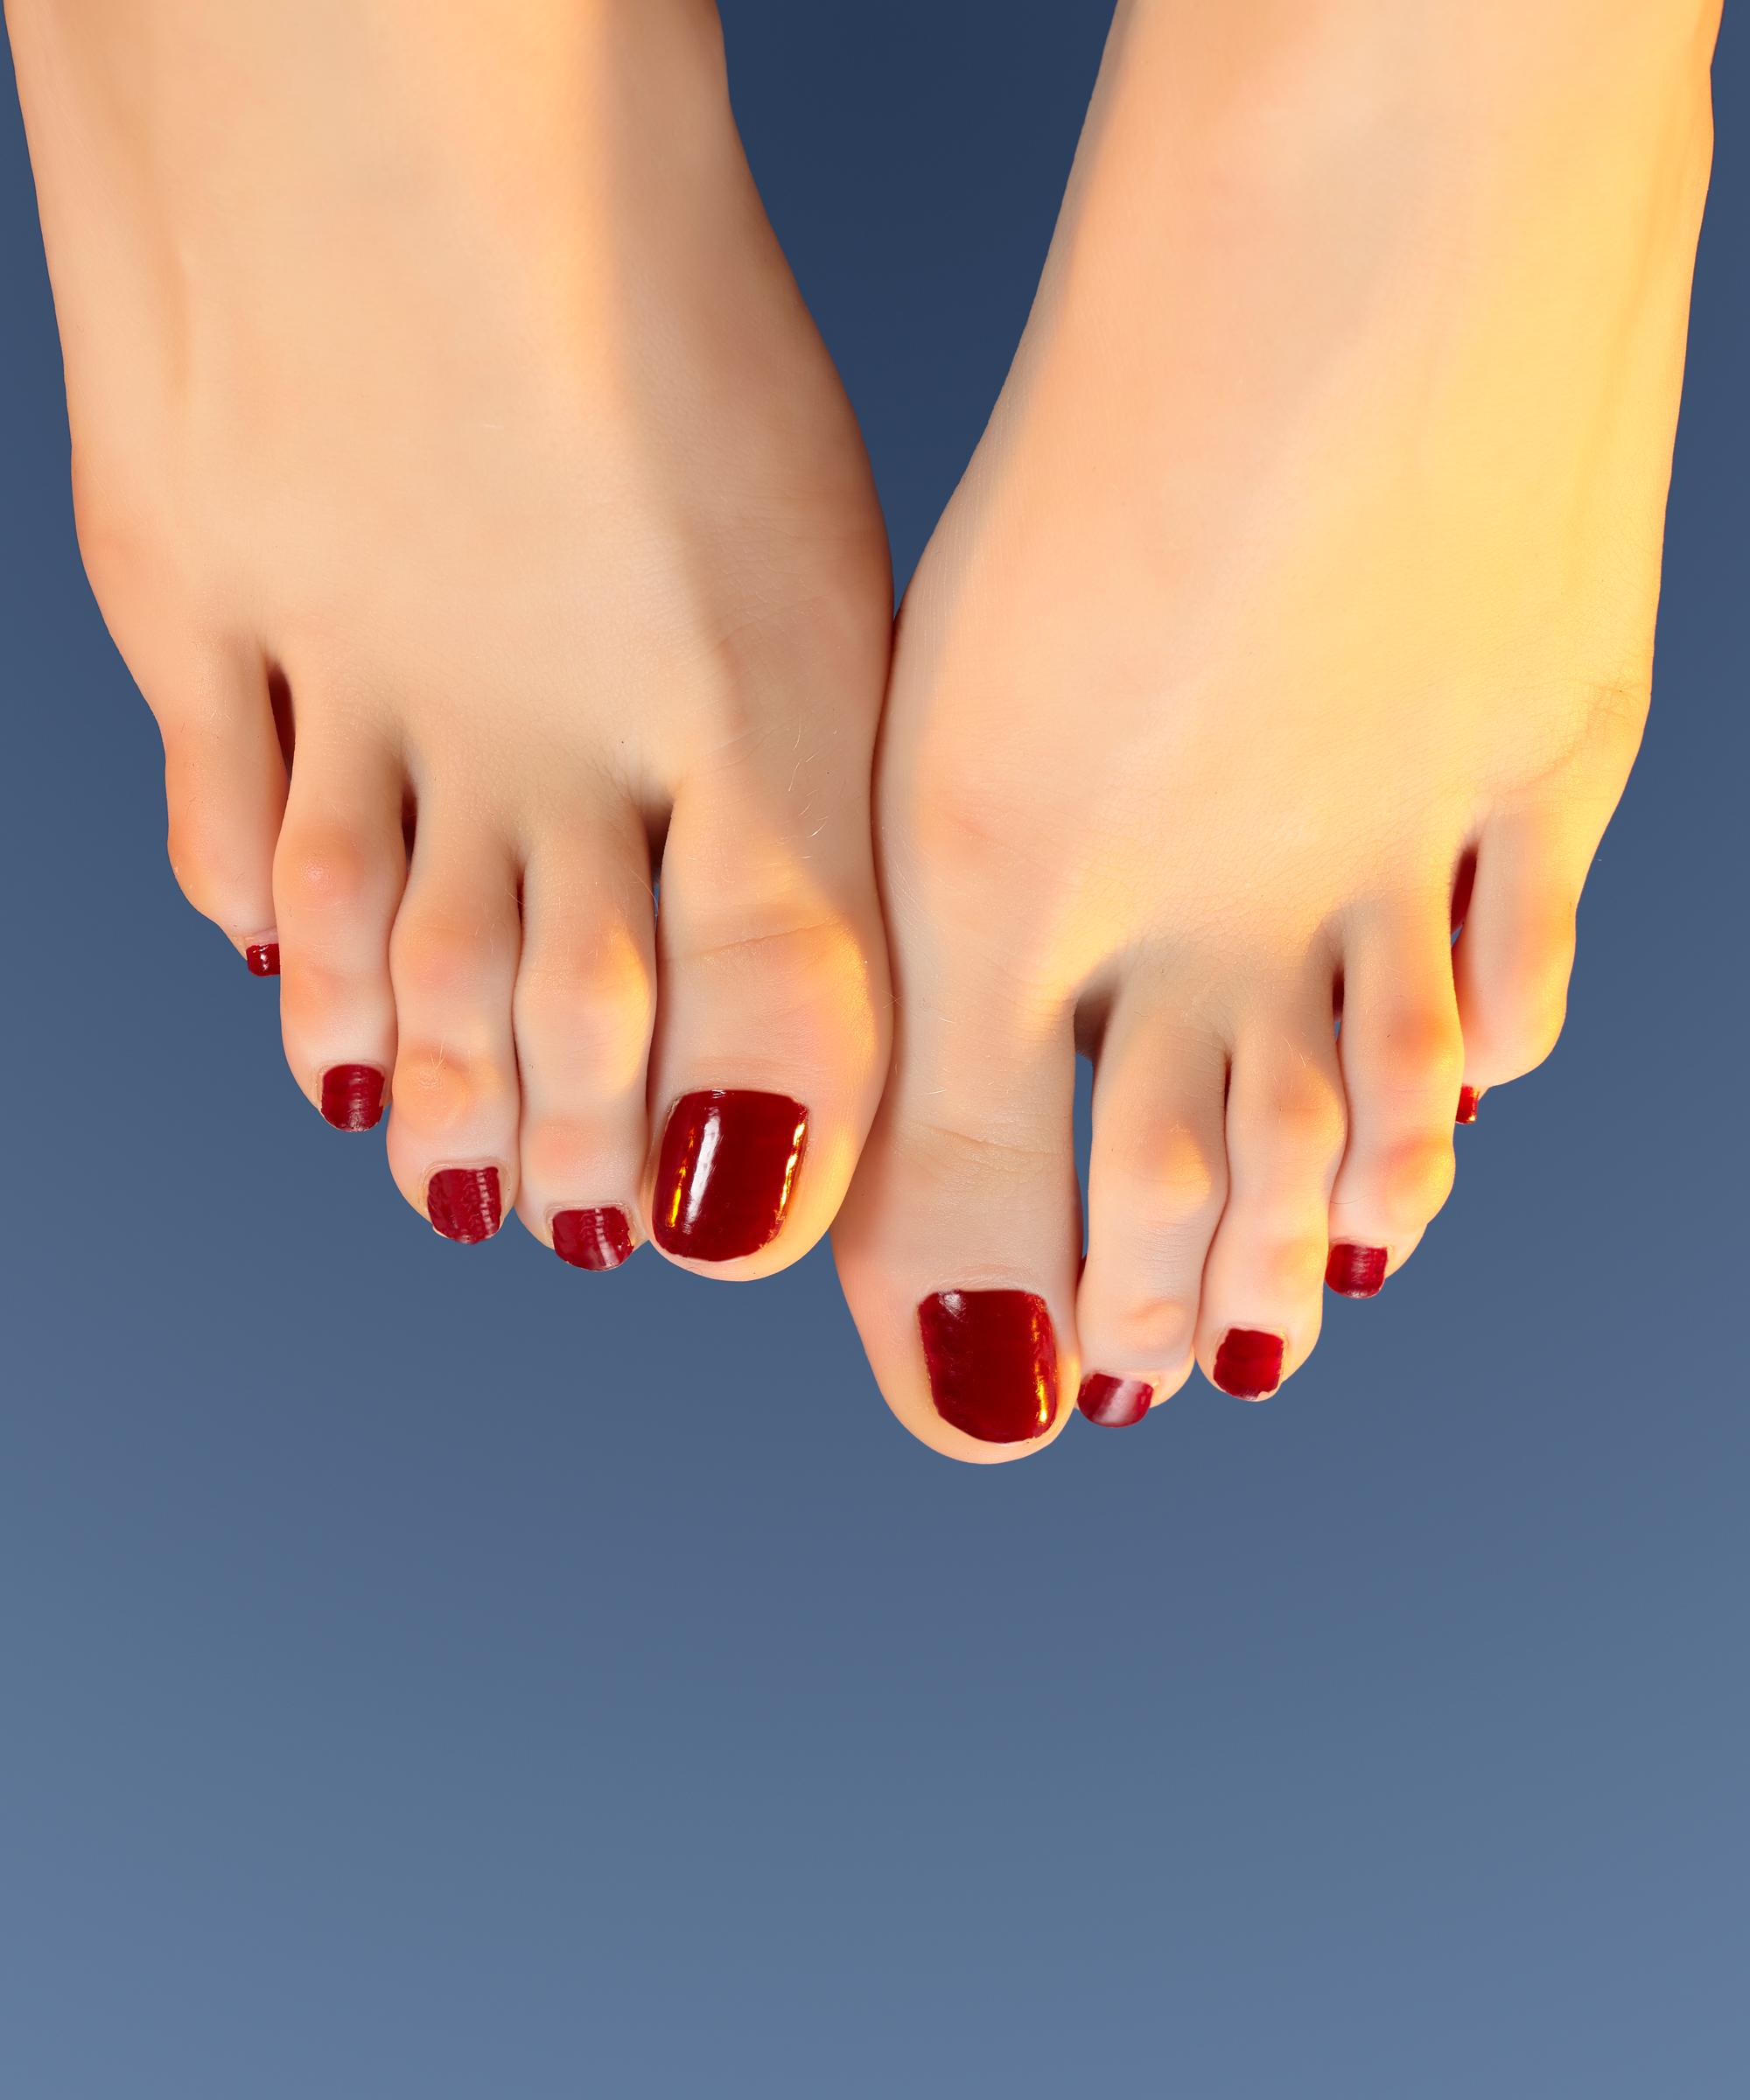 Public foot fetish group